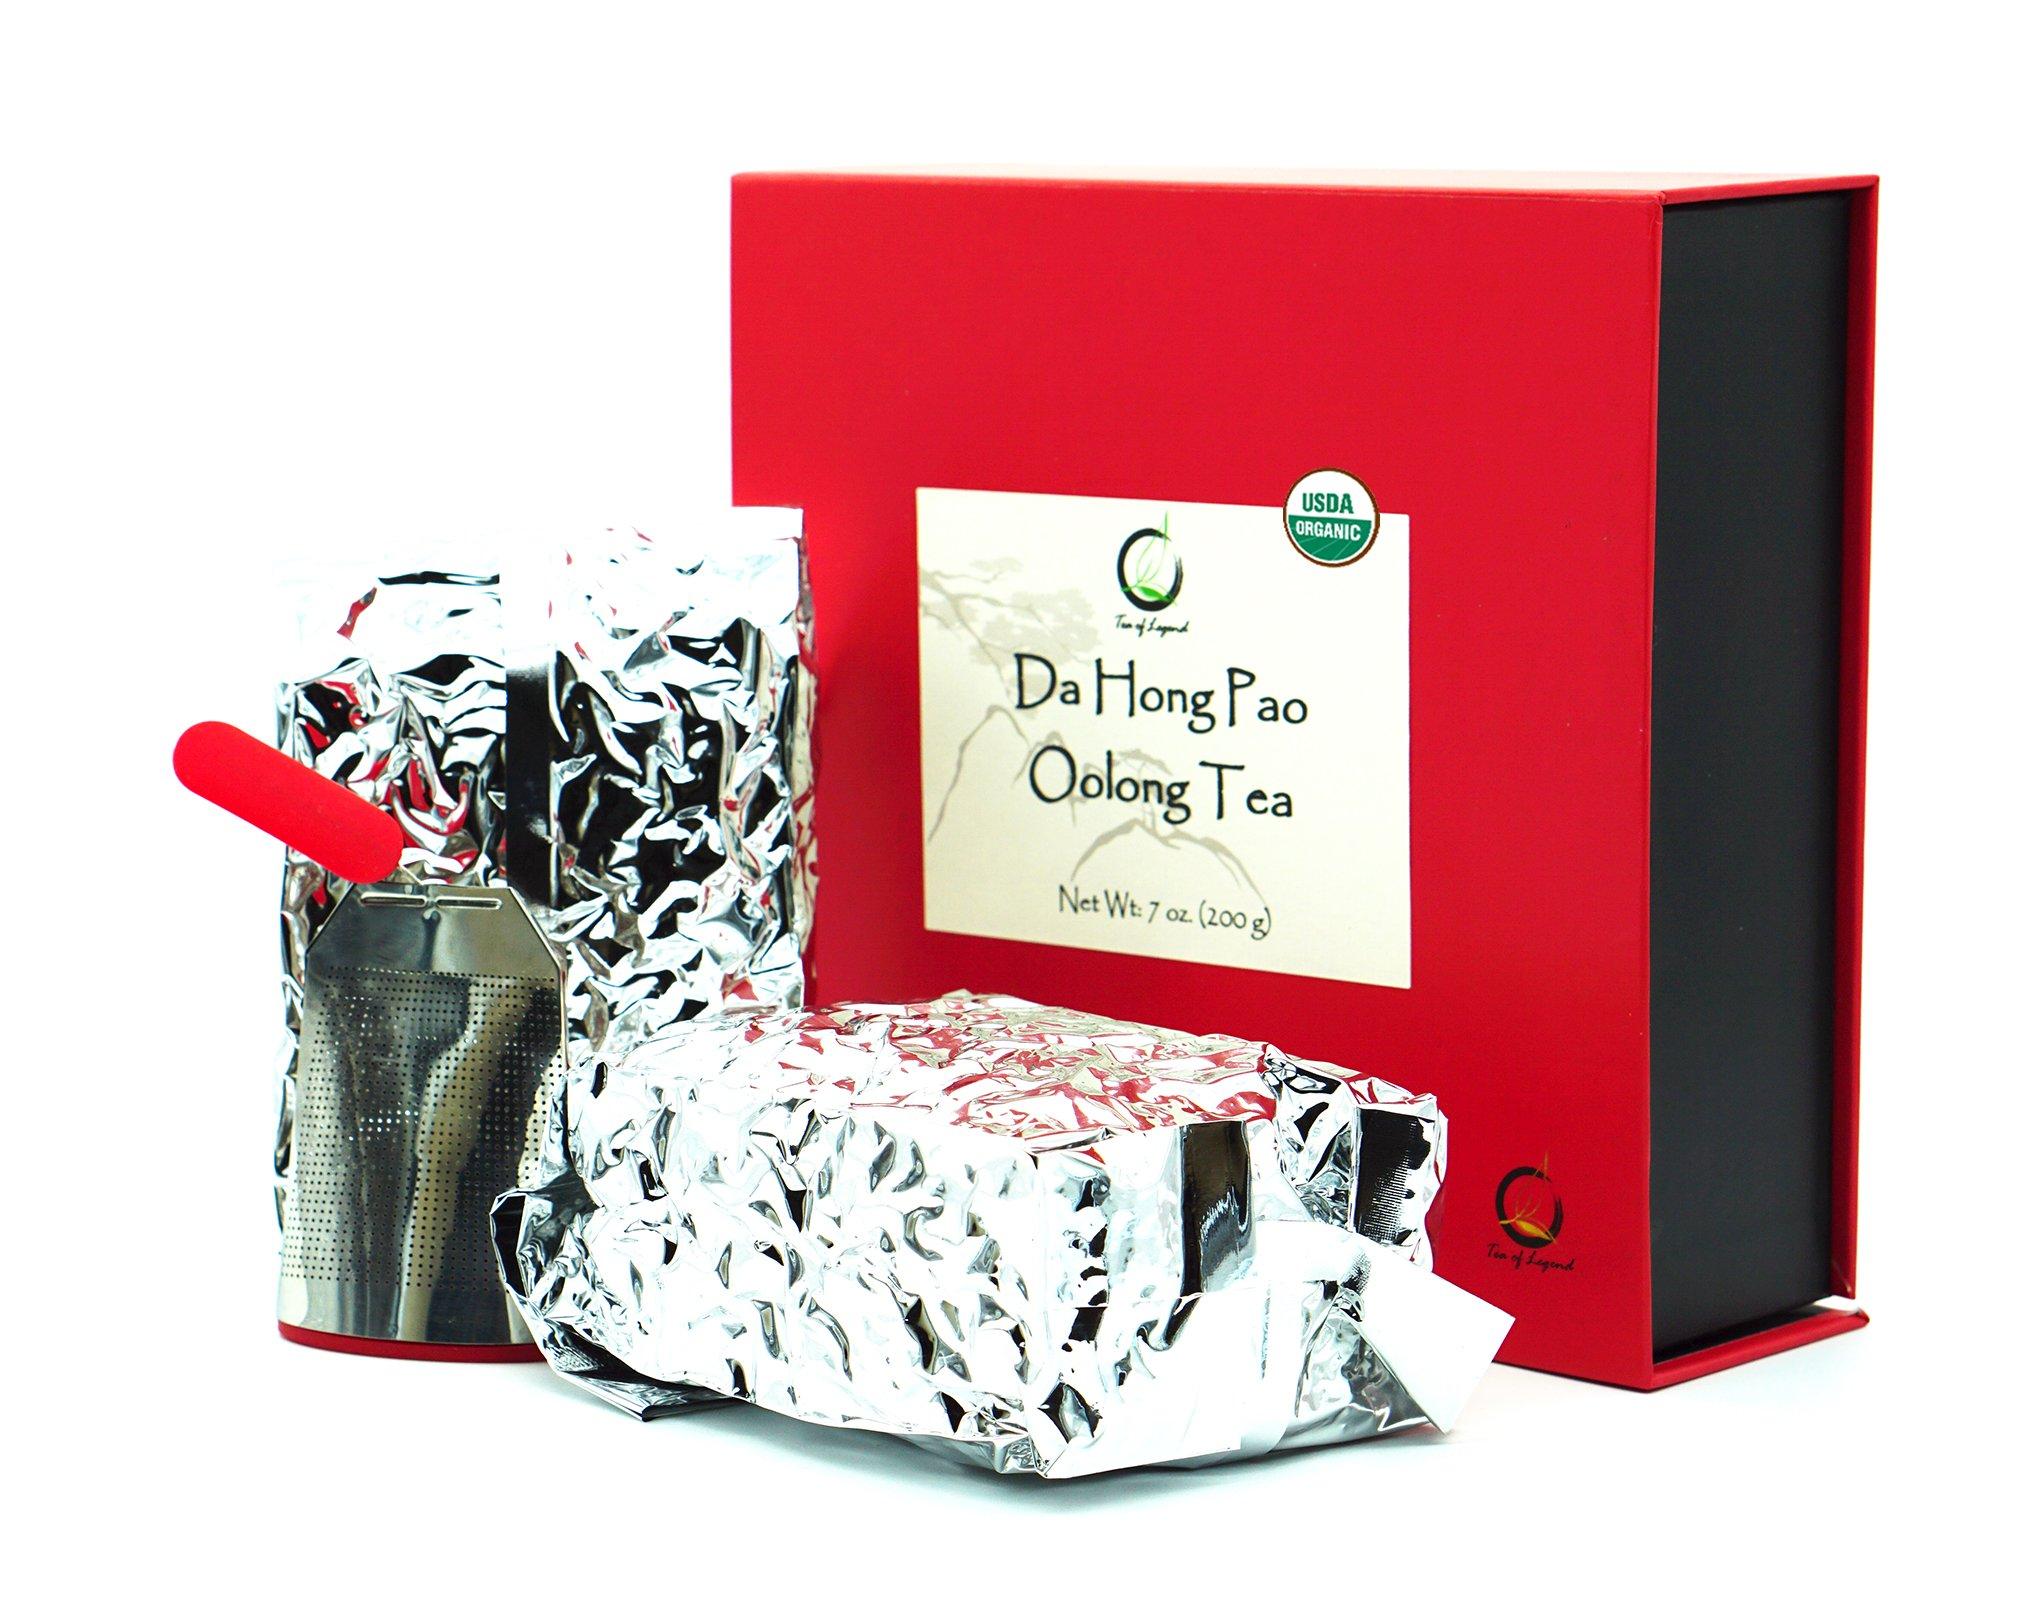 Premium Da Hong Pao Oolong Tea Gift Set